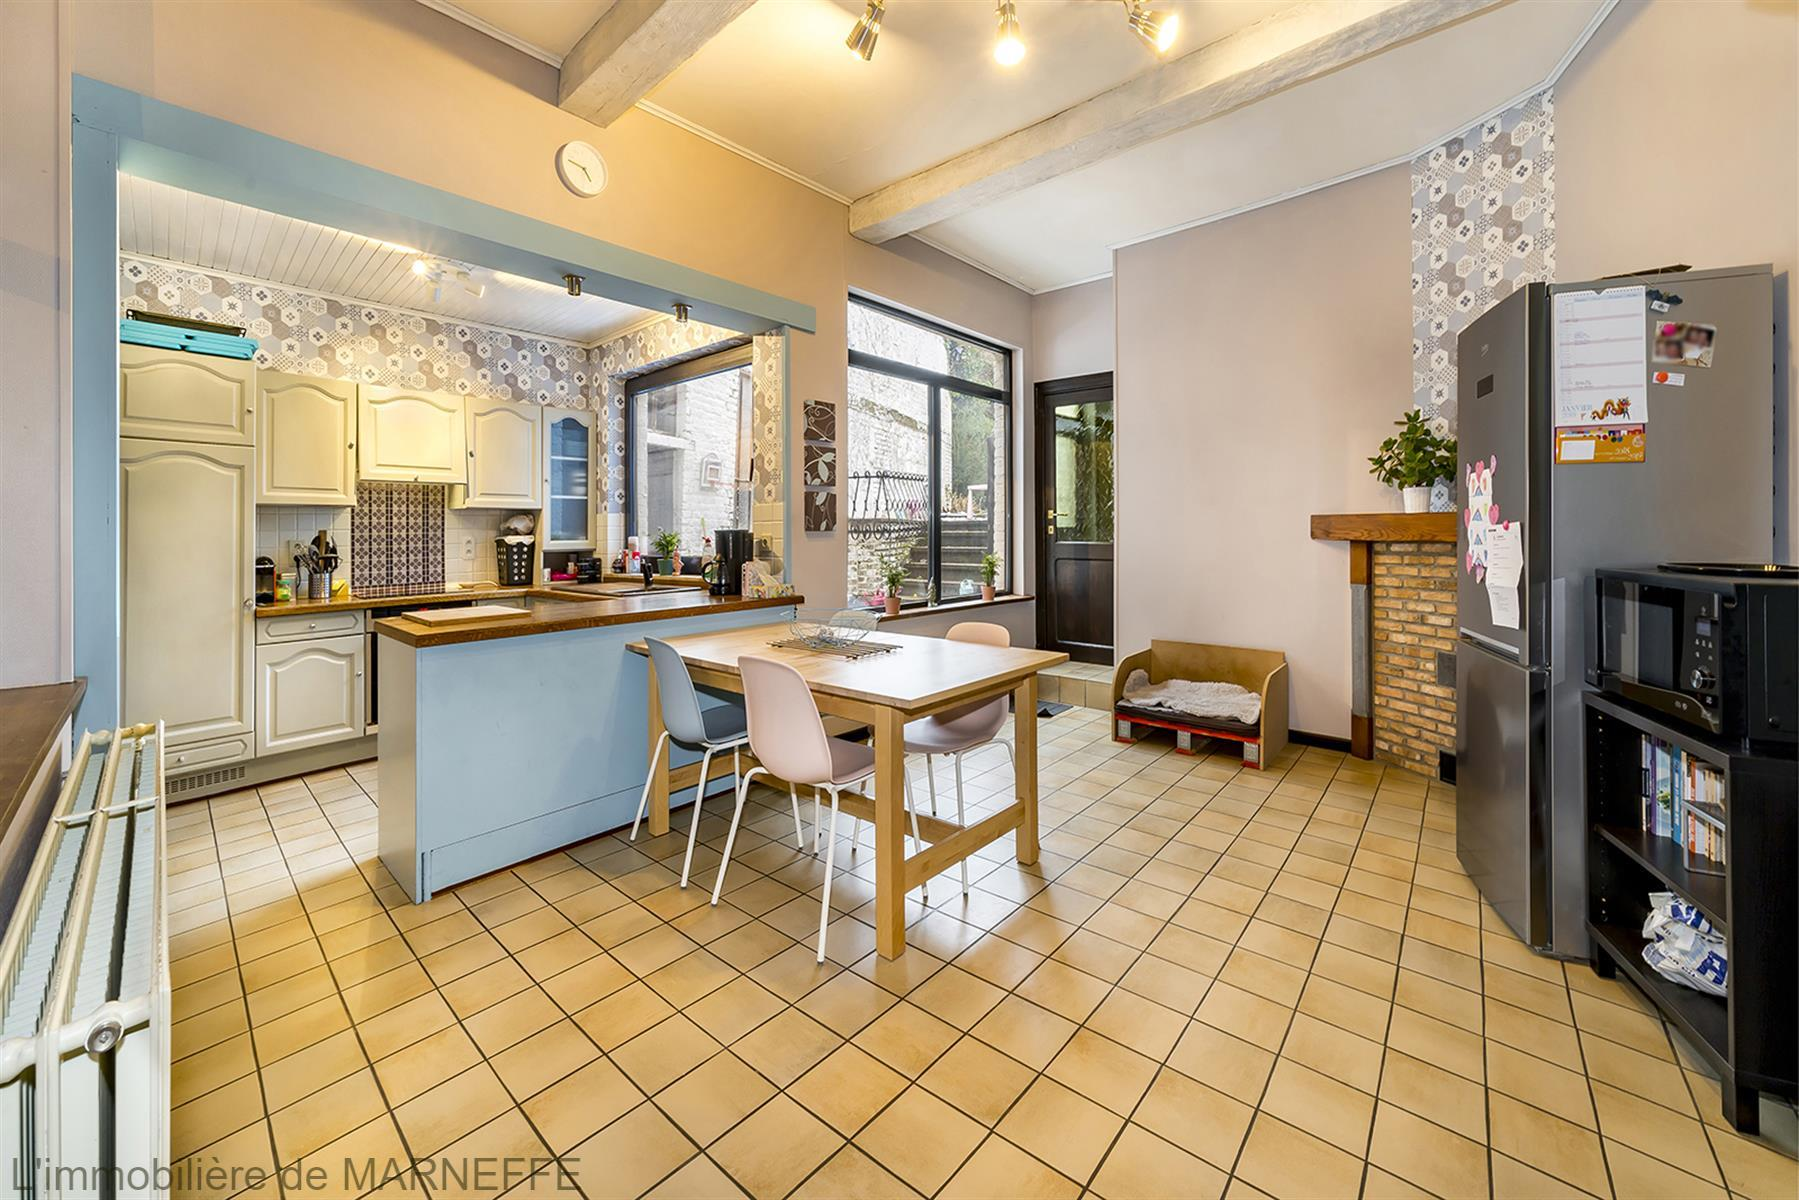 Maison - Remicourt - #3704833-38